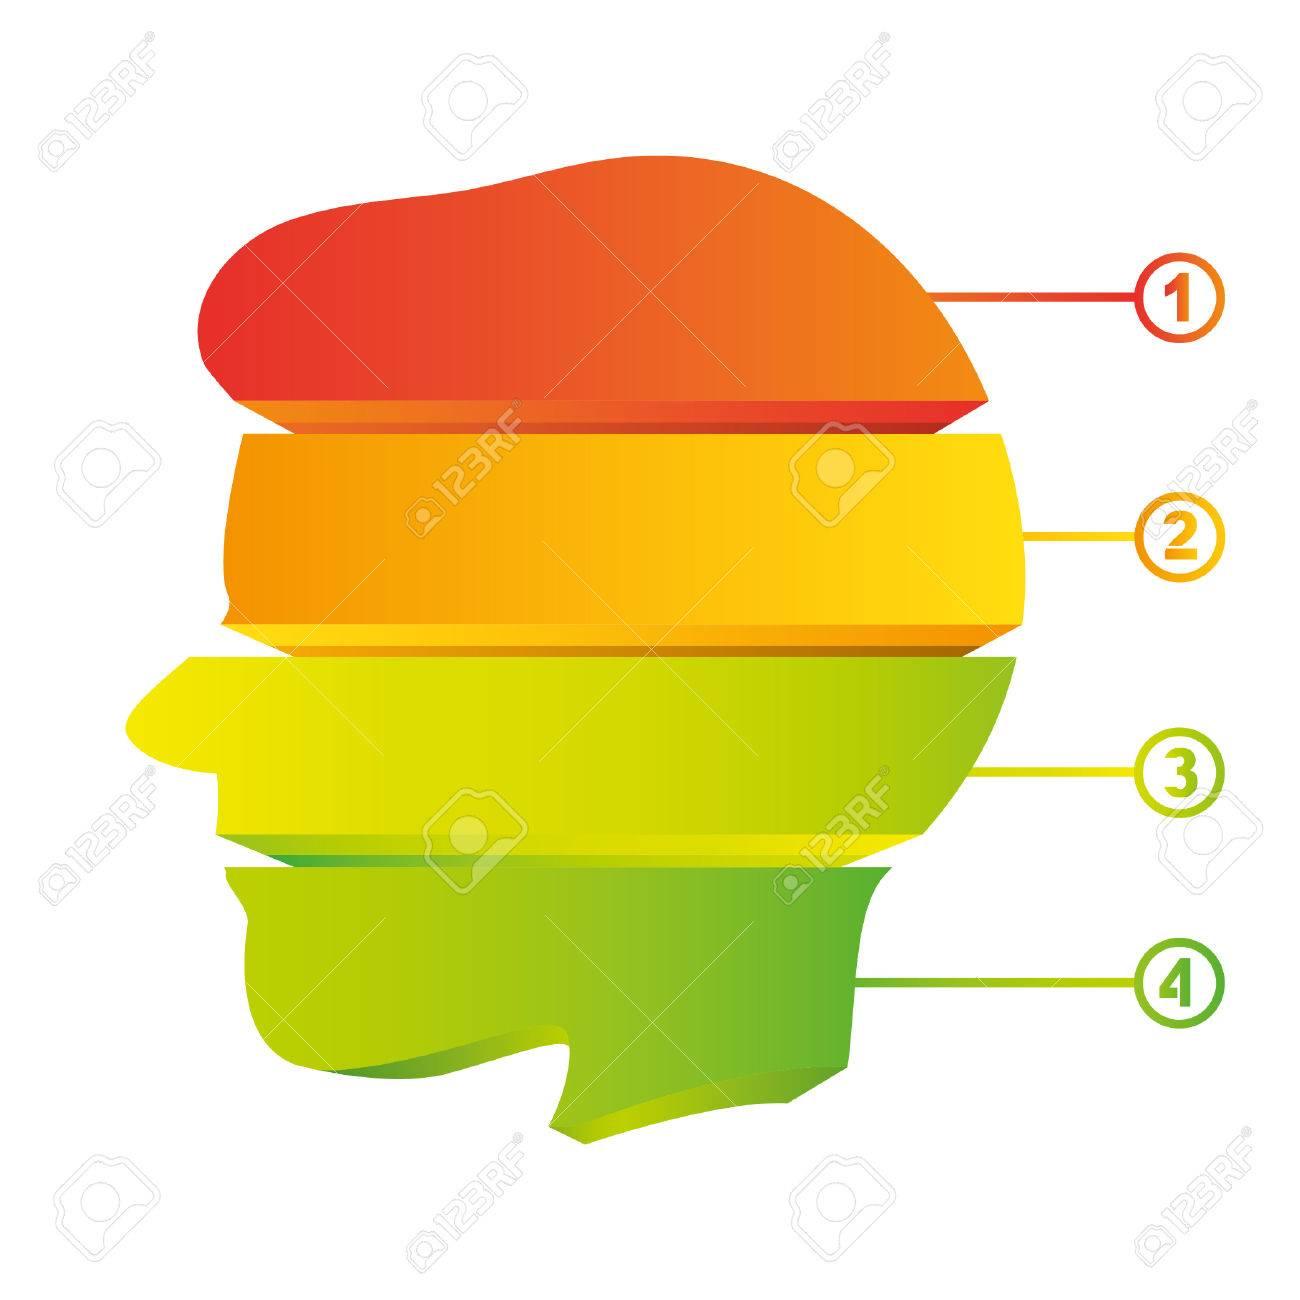 colorful head diagram, creative diagram Stock Vector - 22487980